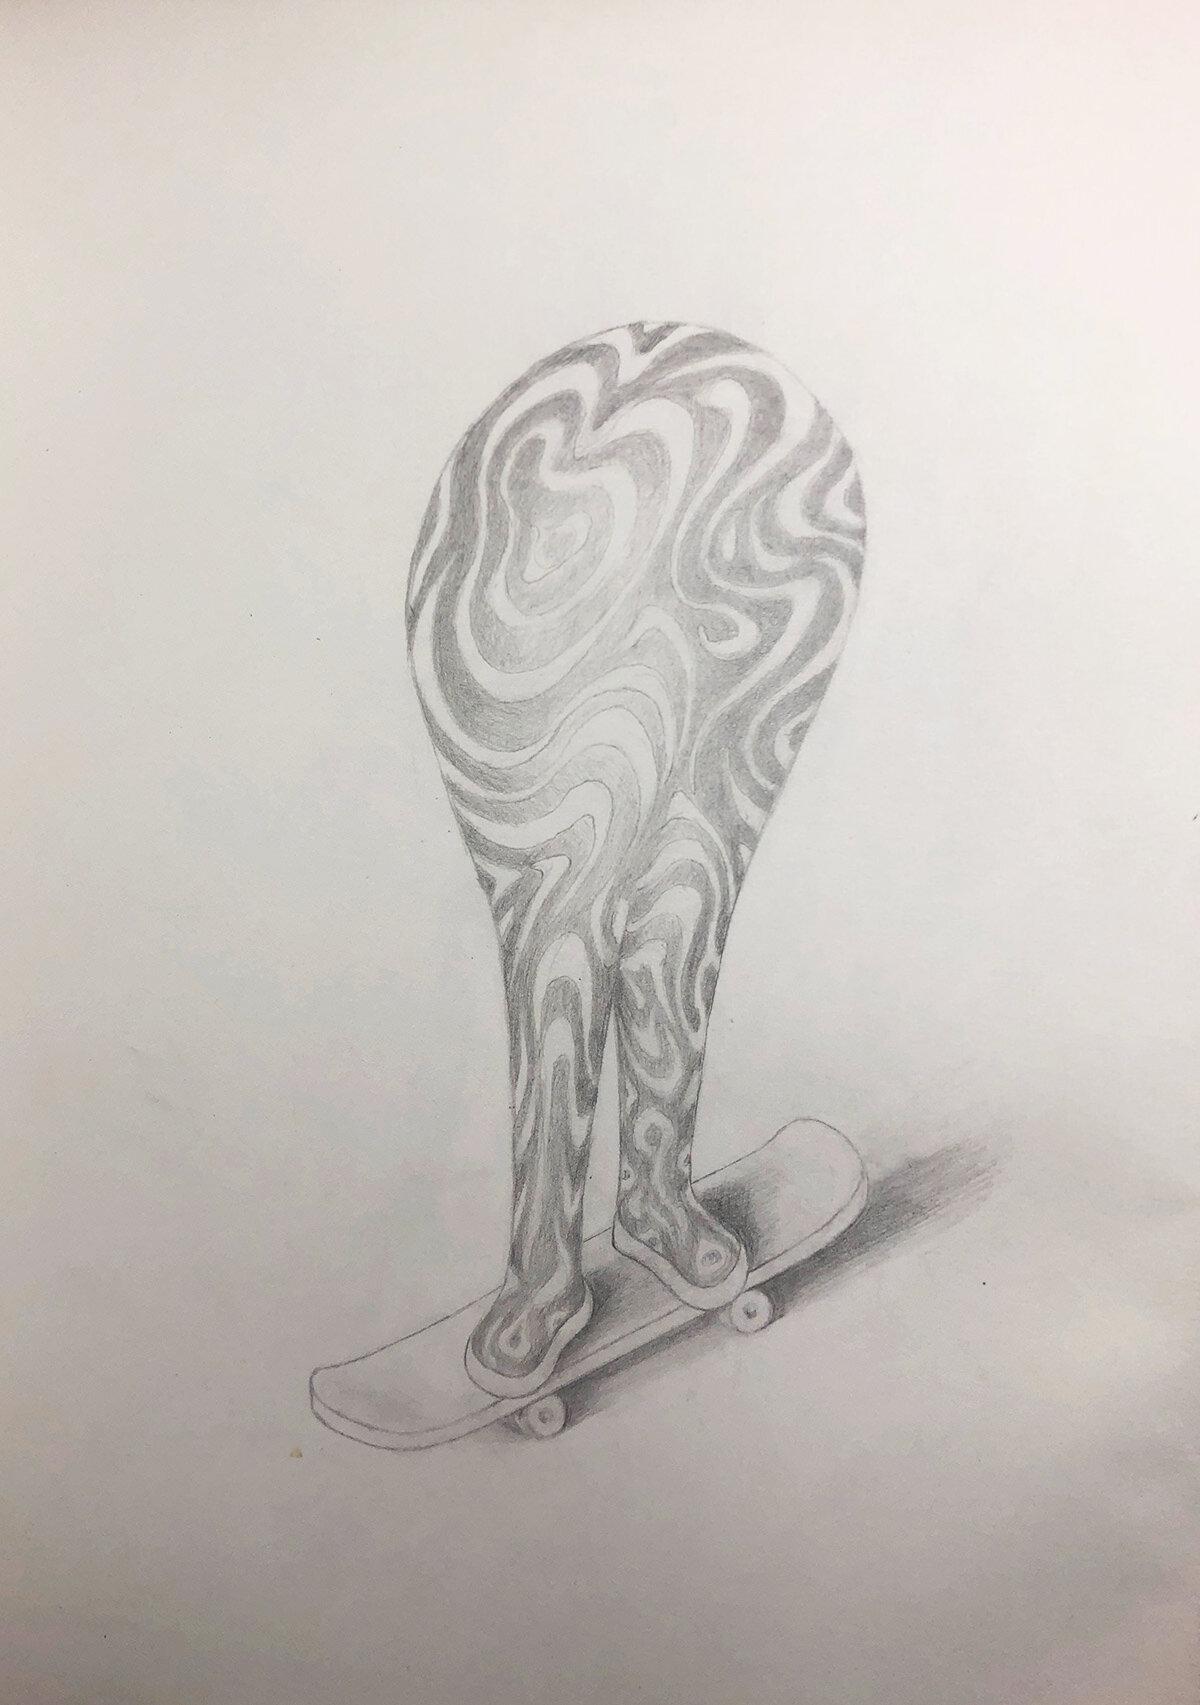 Skateboard Blob Character